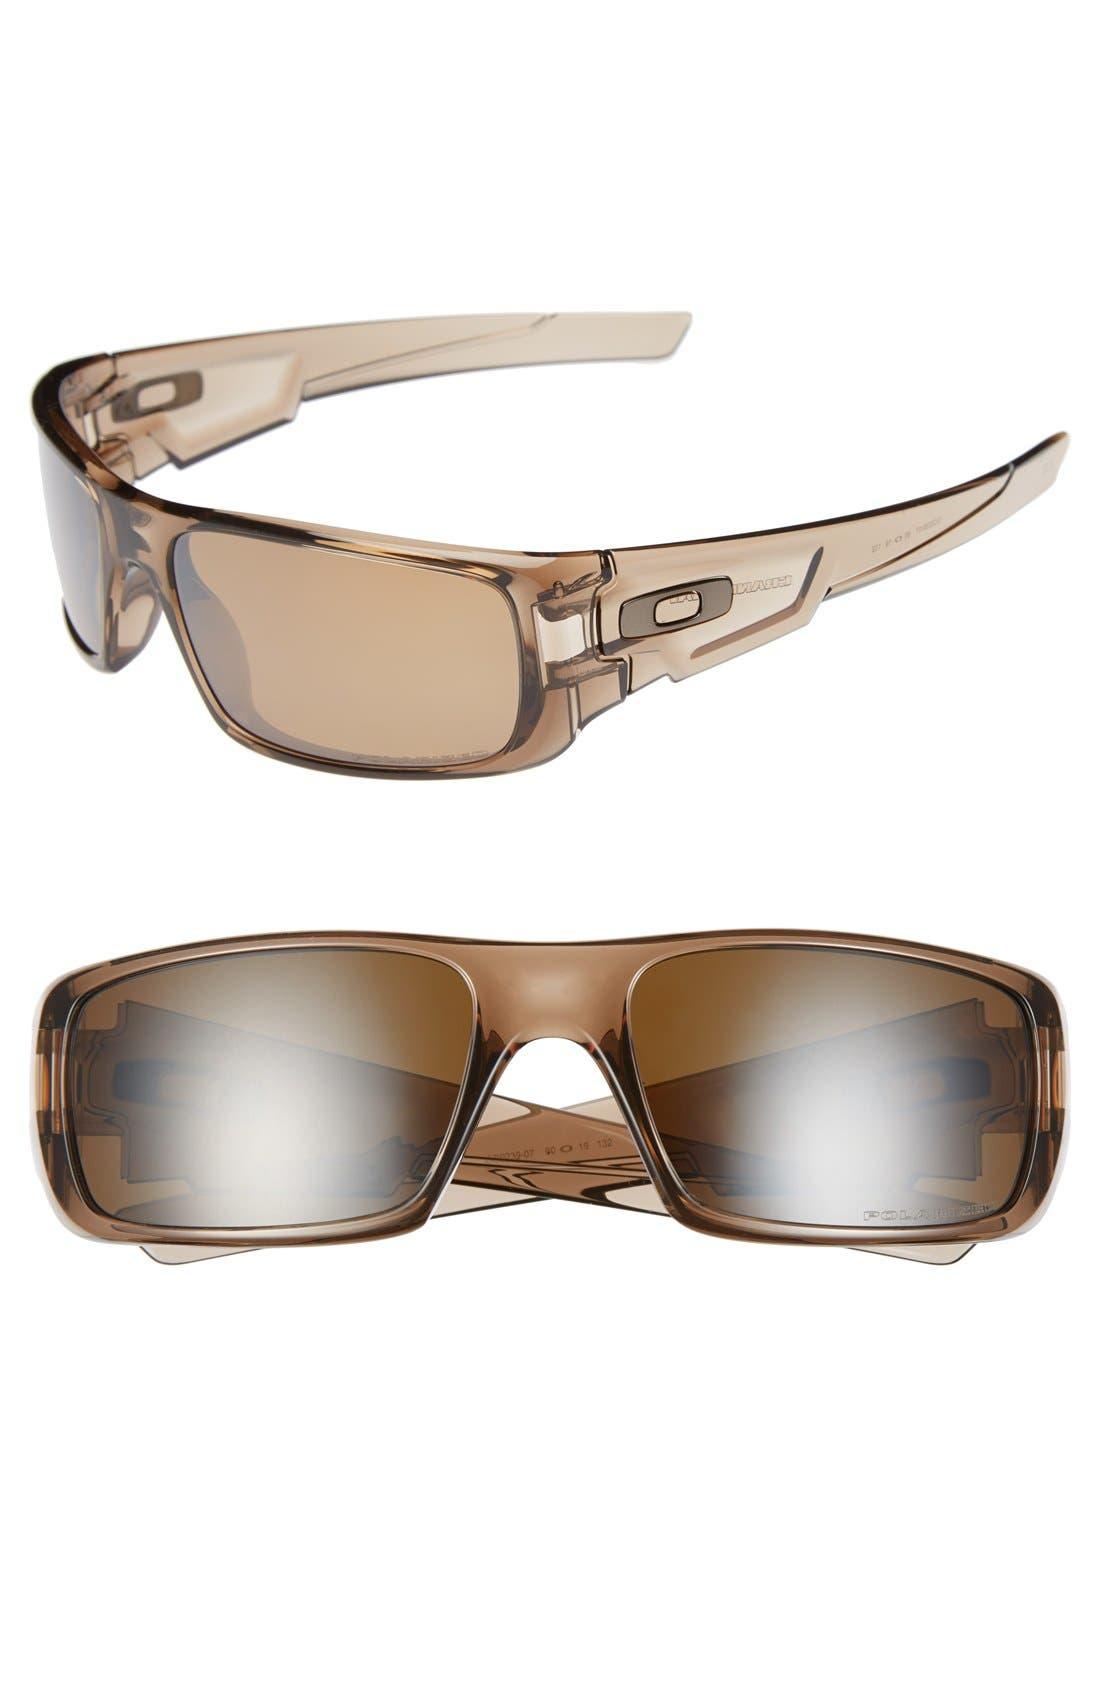 Alternate Image 1 Selected - Oakley 'Crankshaft' 60mm Polarized Sunglasses